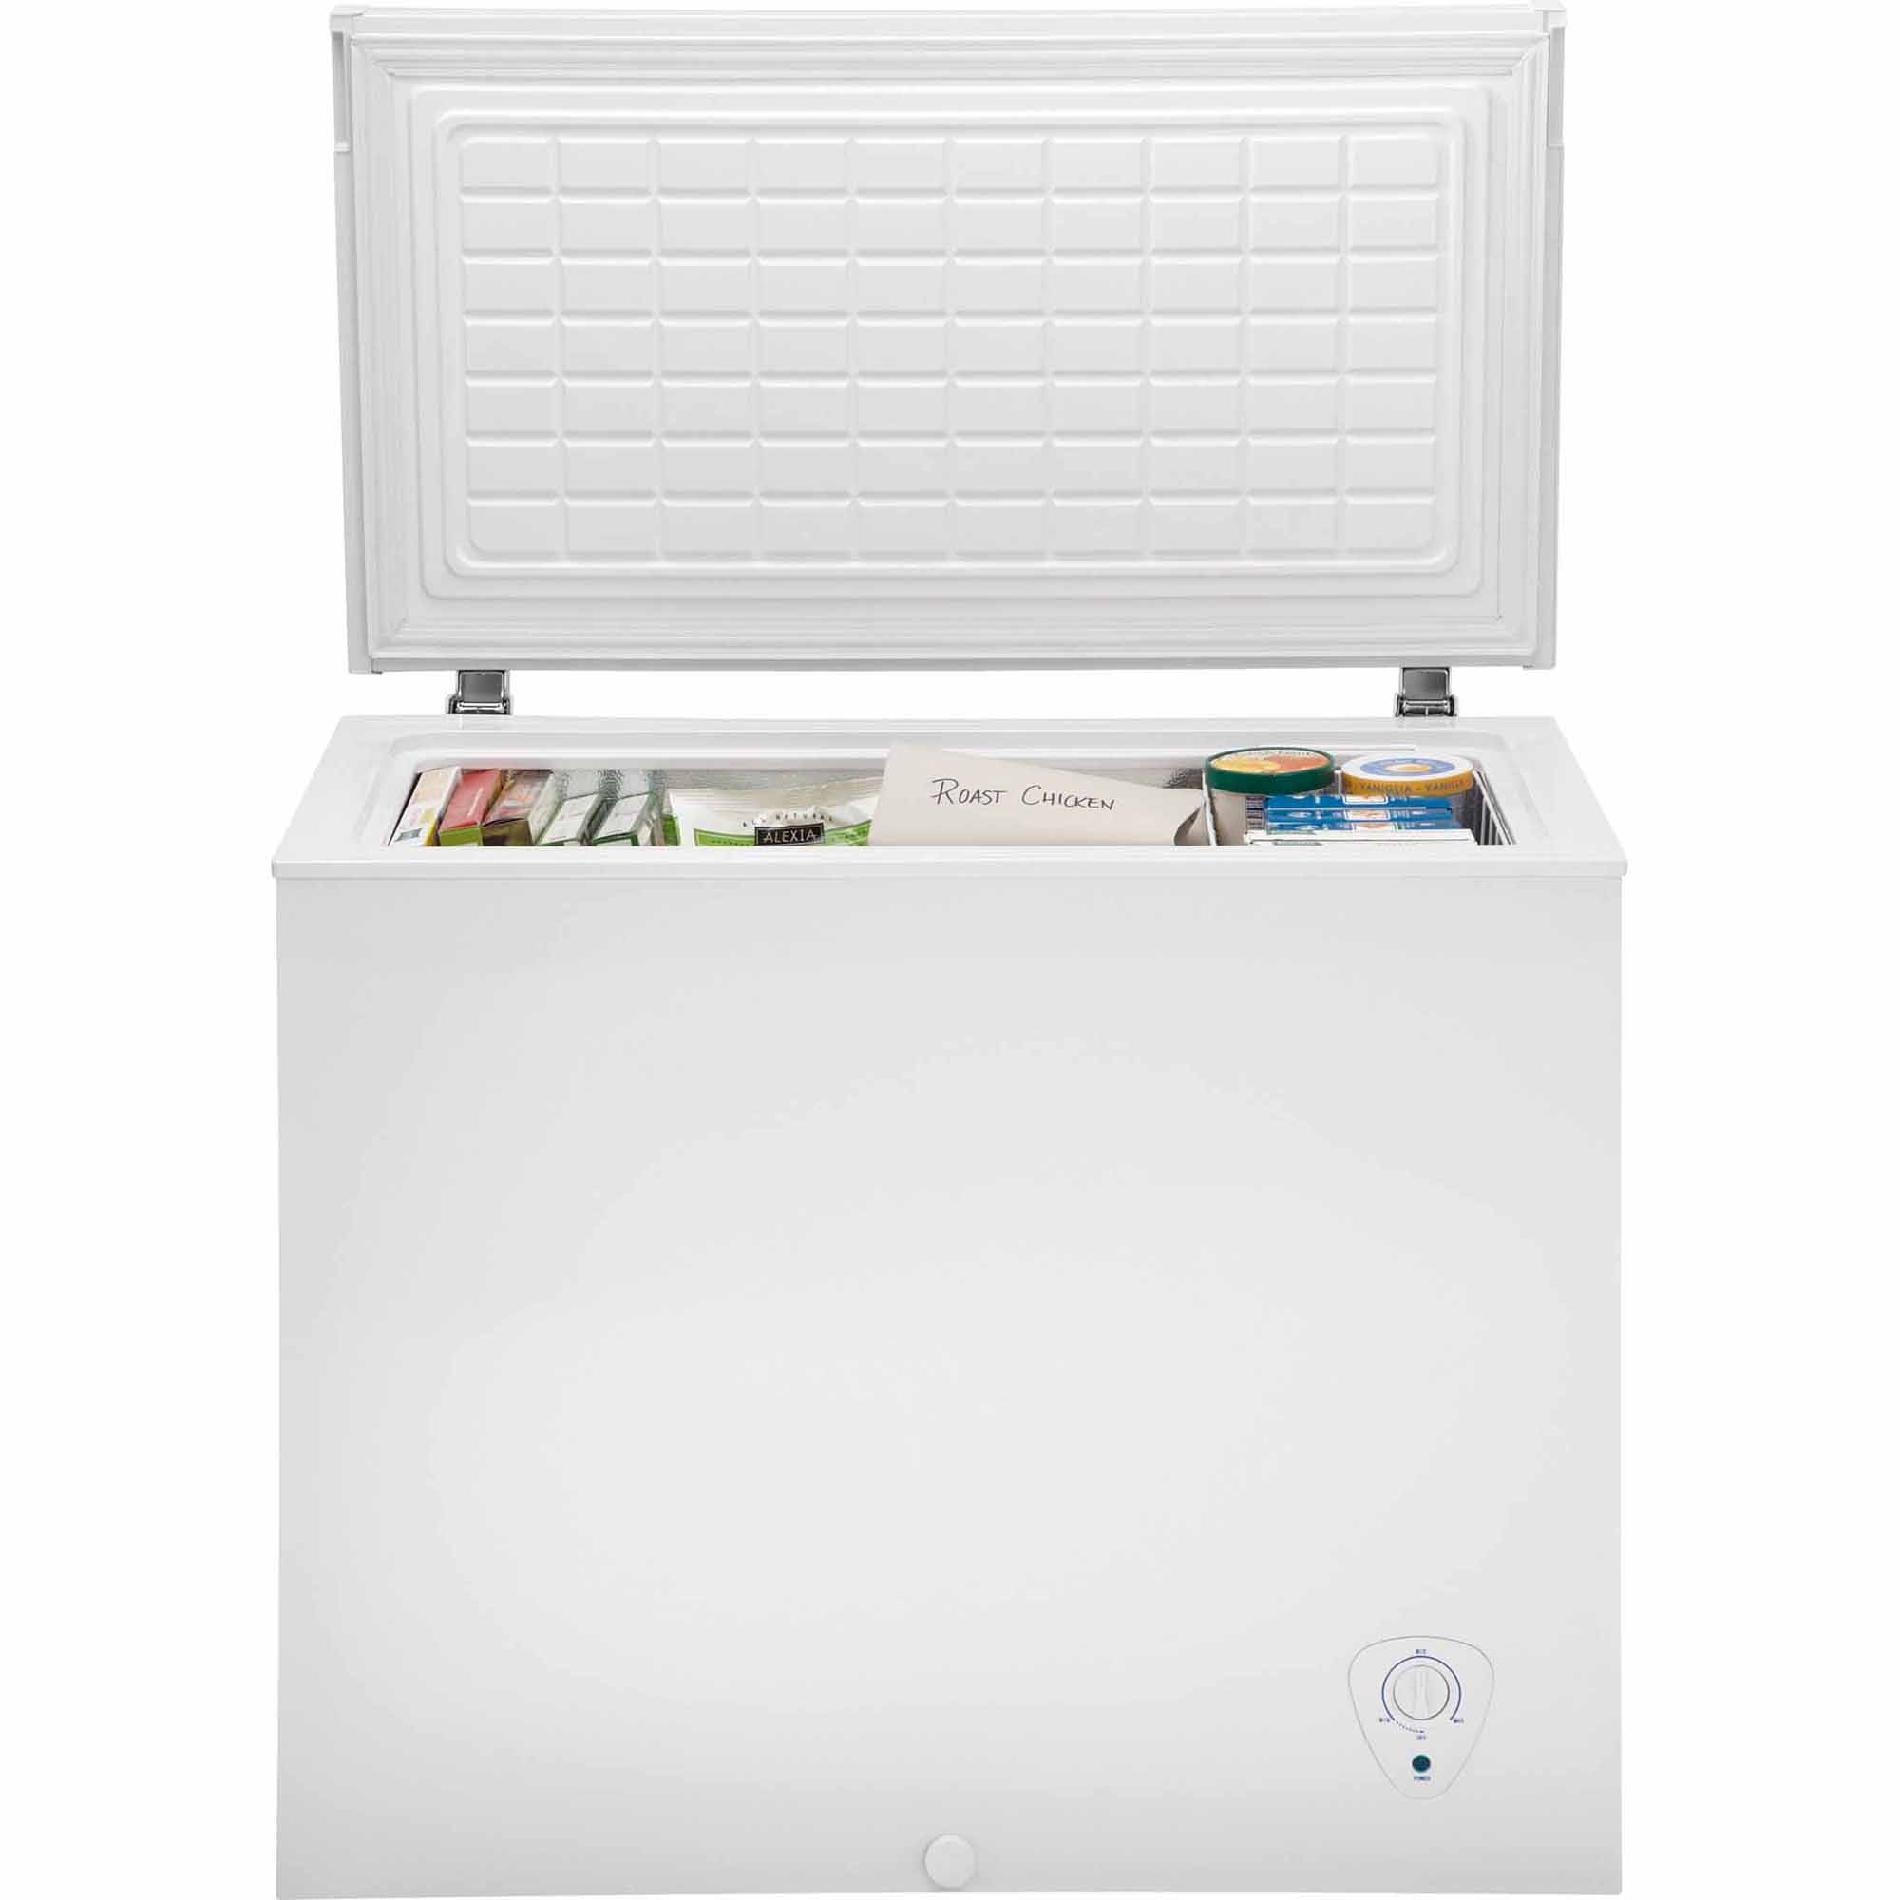 kenmore 12702 7 2 cu ft chest freezer whitekenmore freezer 8 [ 1900 x 1900 Pixel ]